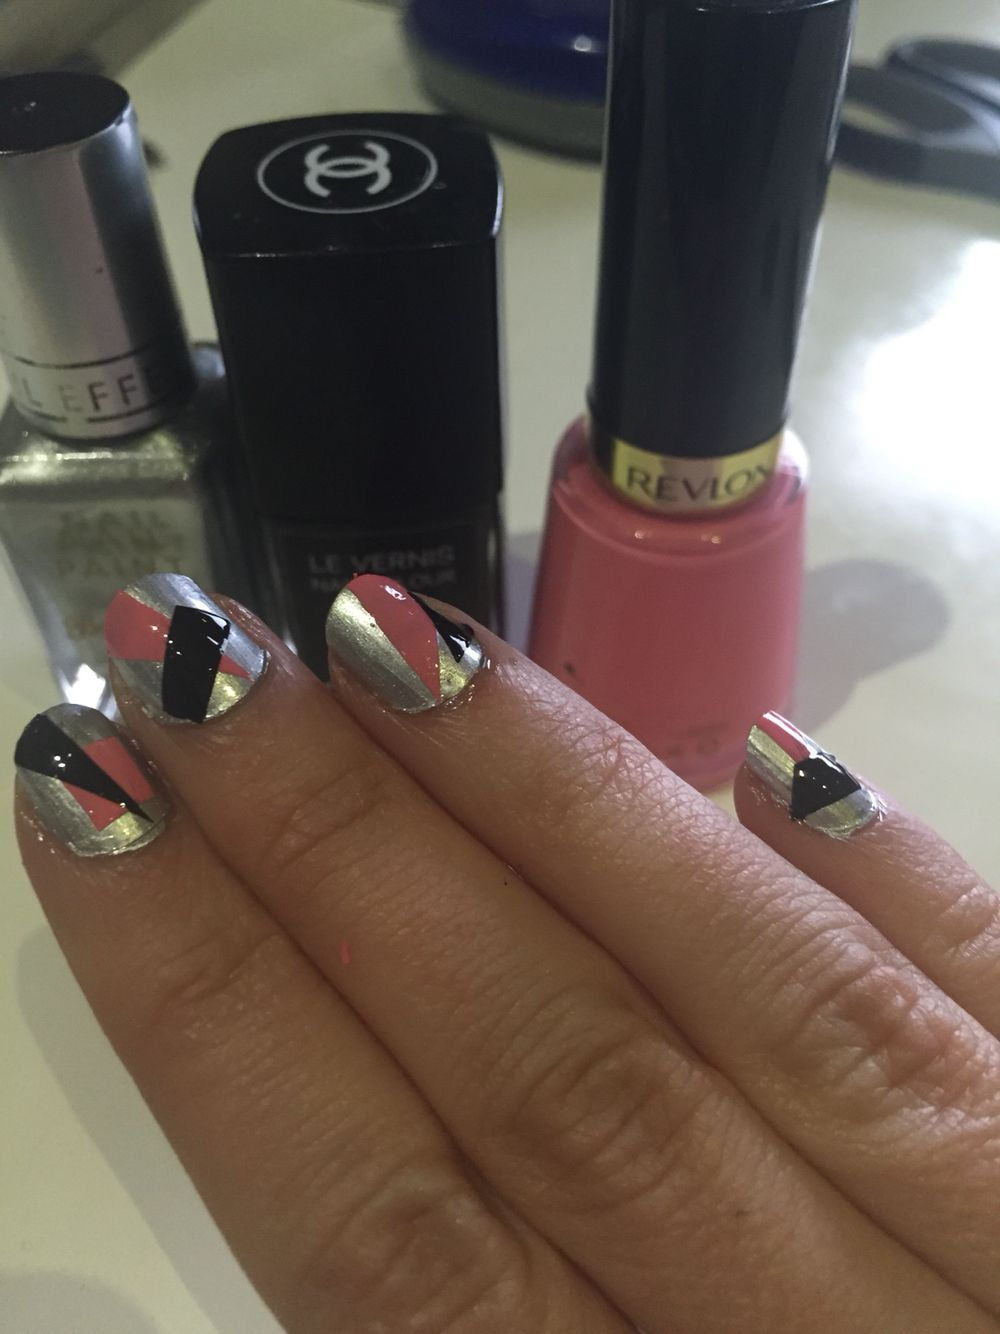 Geometric nails. Paint a ziplock bag, wait for the polish